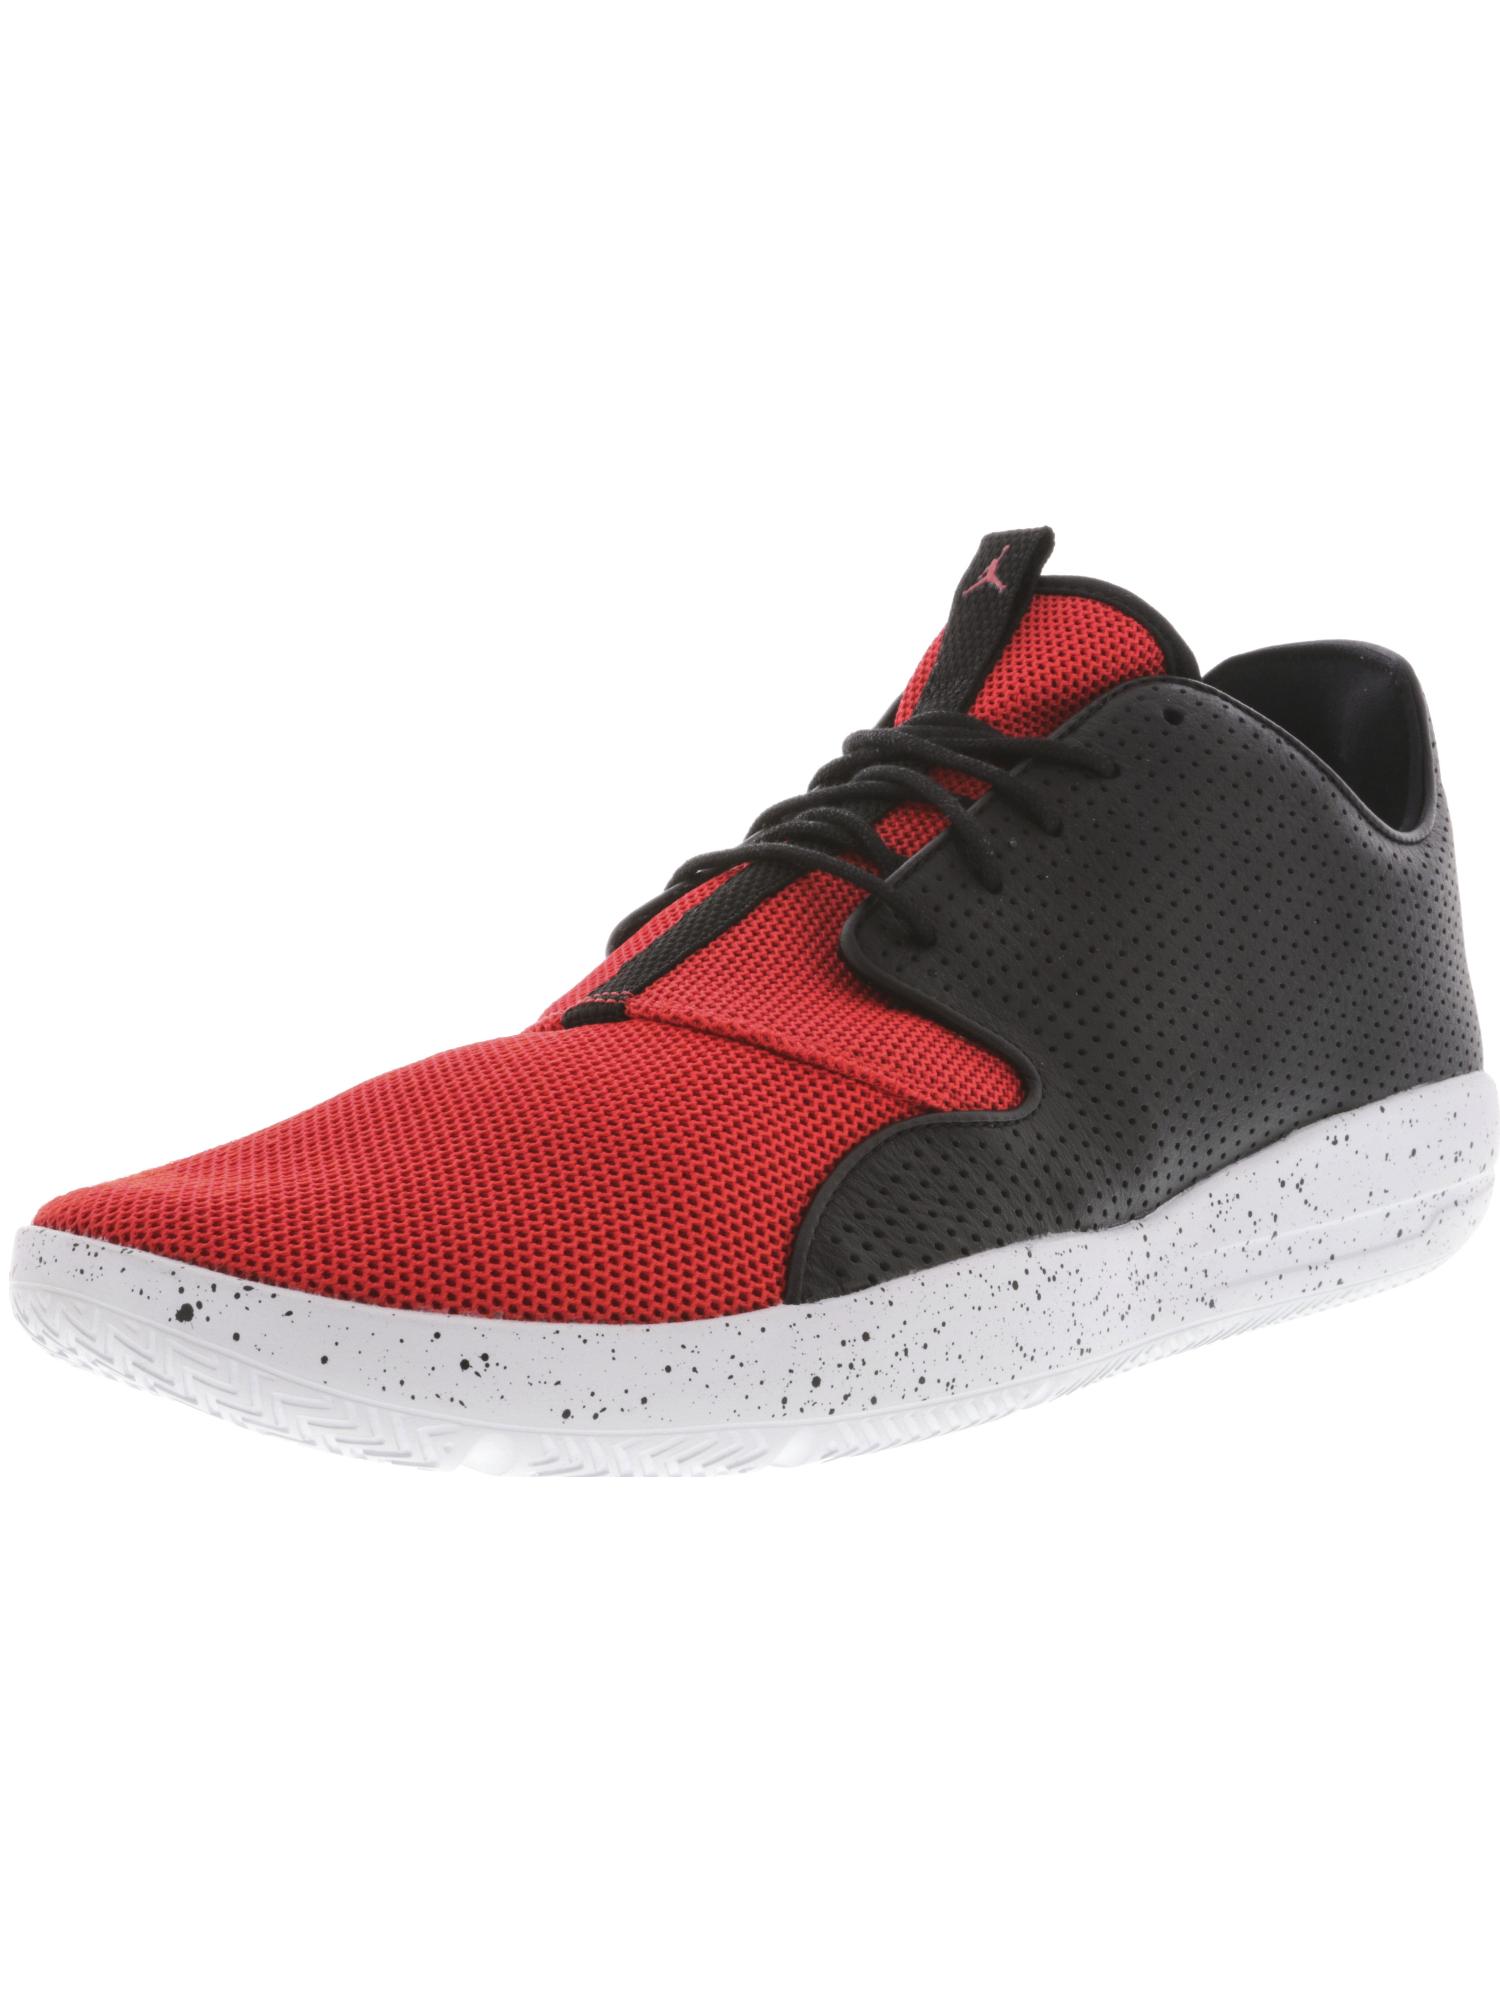 f45e4794d489c ... Nike Men s Jordan Eclipse Ankle-High Mesh Basketball Shoe Shoe Shoe  96681b ...